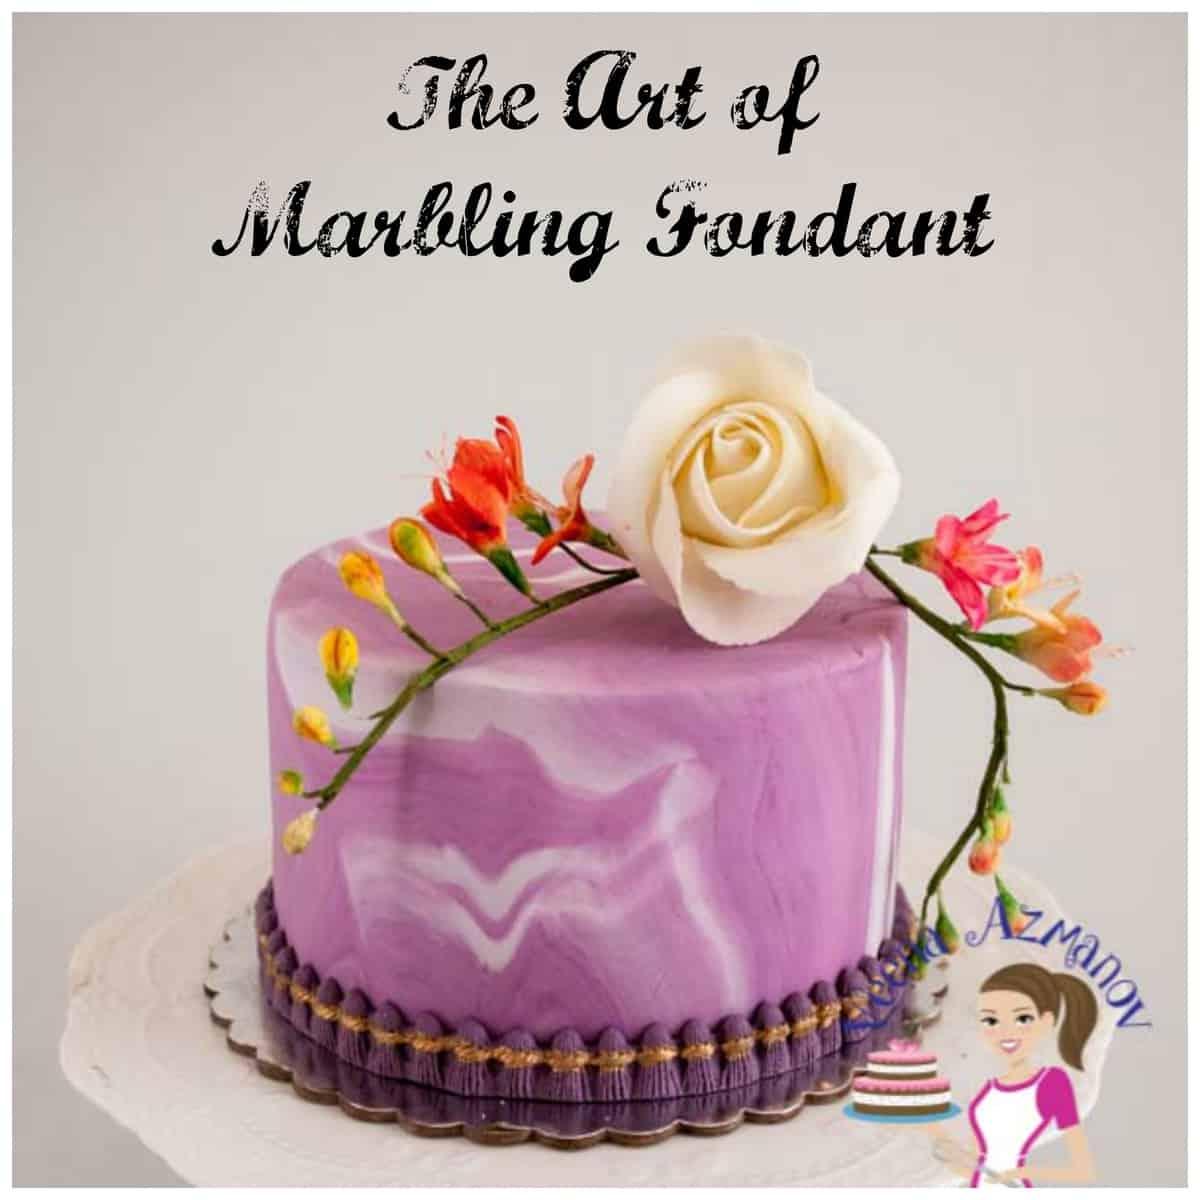 Veena Art Of Cake Fondant Recipe : The art of Marbling Fondant - How to Marble Fondant ...